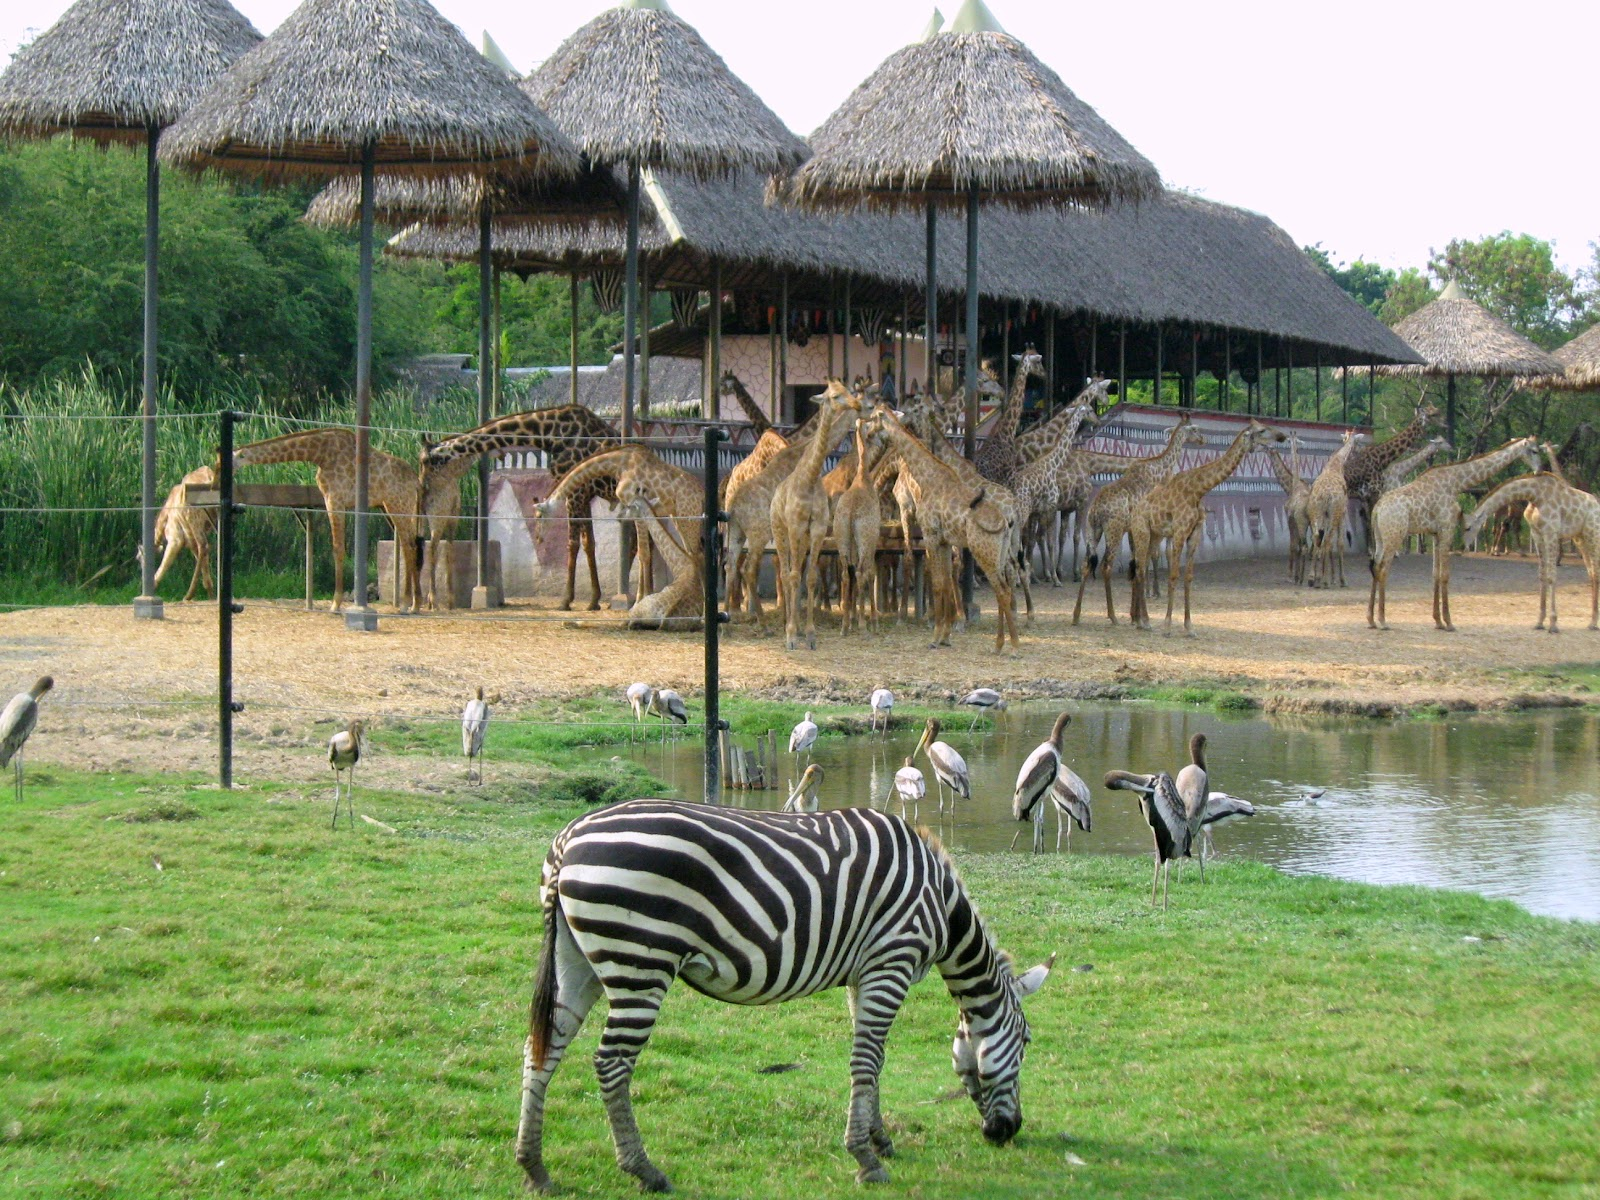 MindPatience: The Safari World - Bangkok